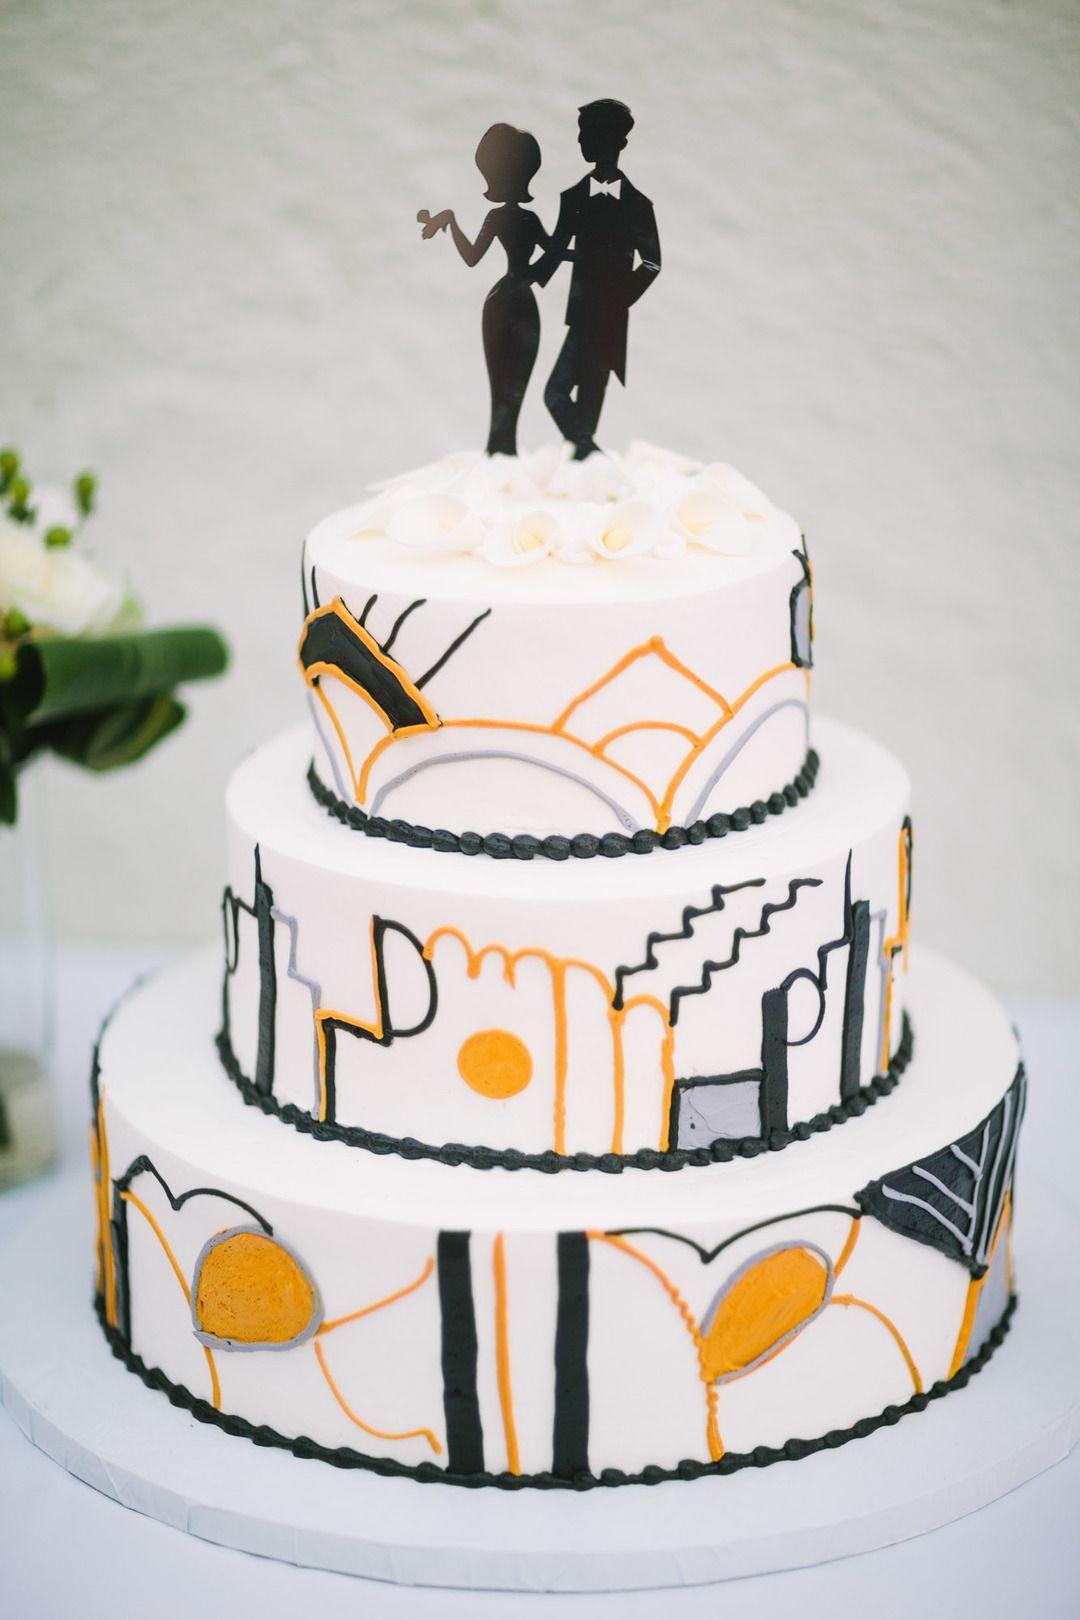 wedding cakes in lagunbeach ca%0A Chic wedding cake  black and yellow design  silhouette cake topper  California  wedding